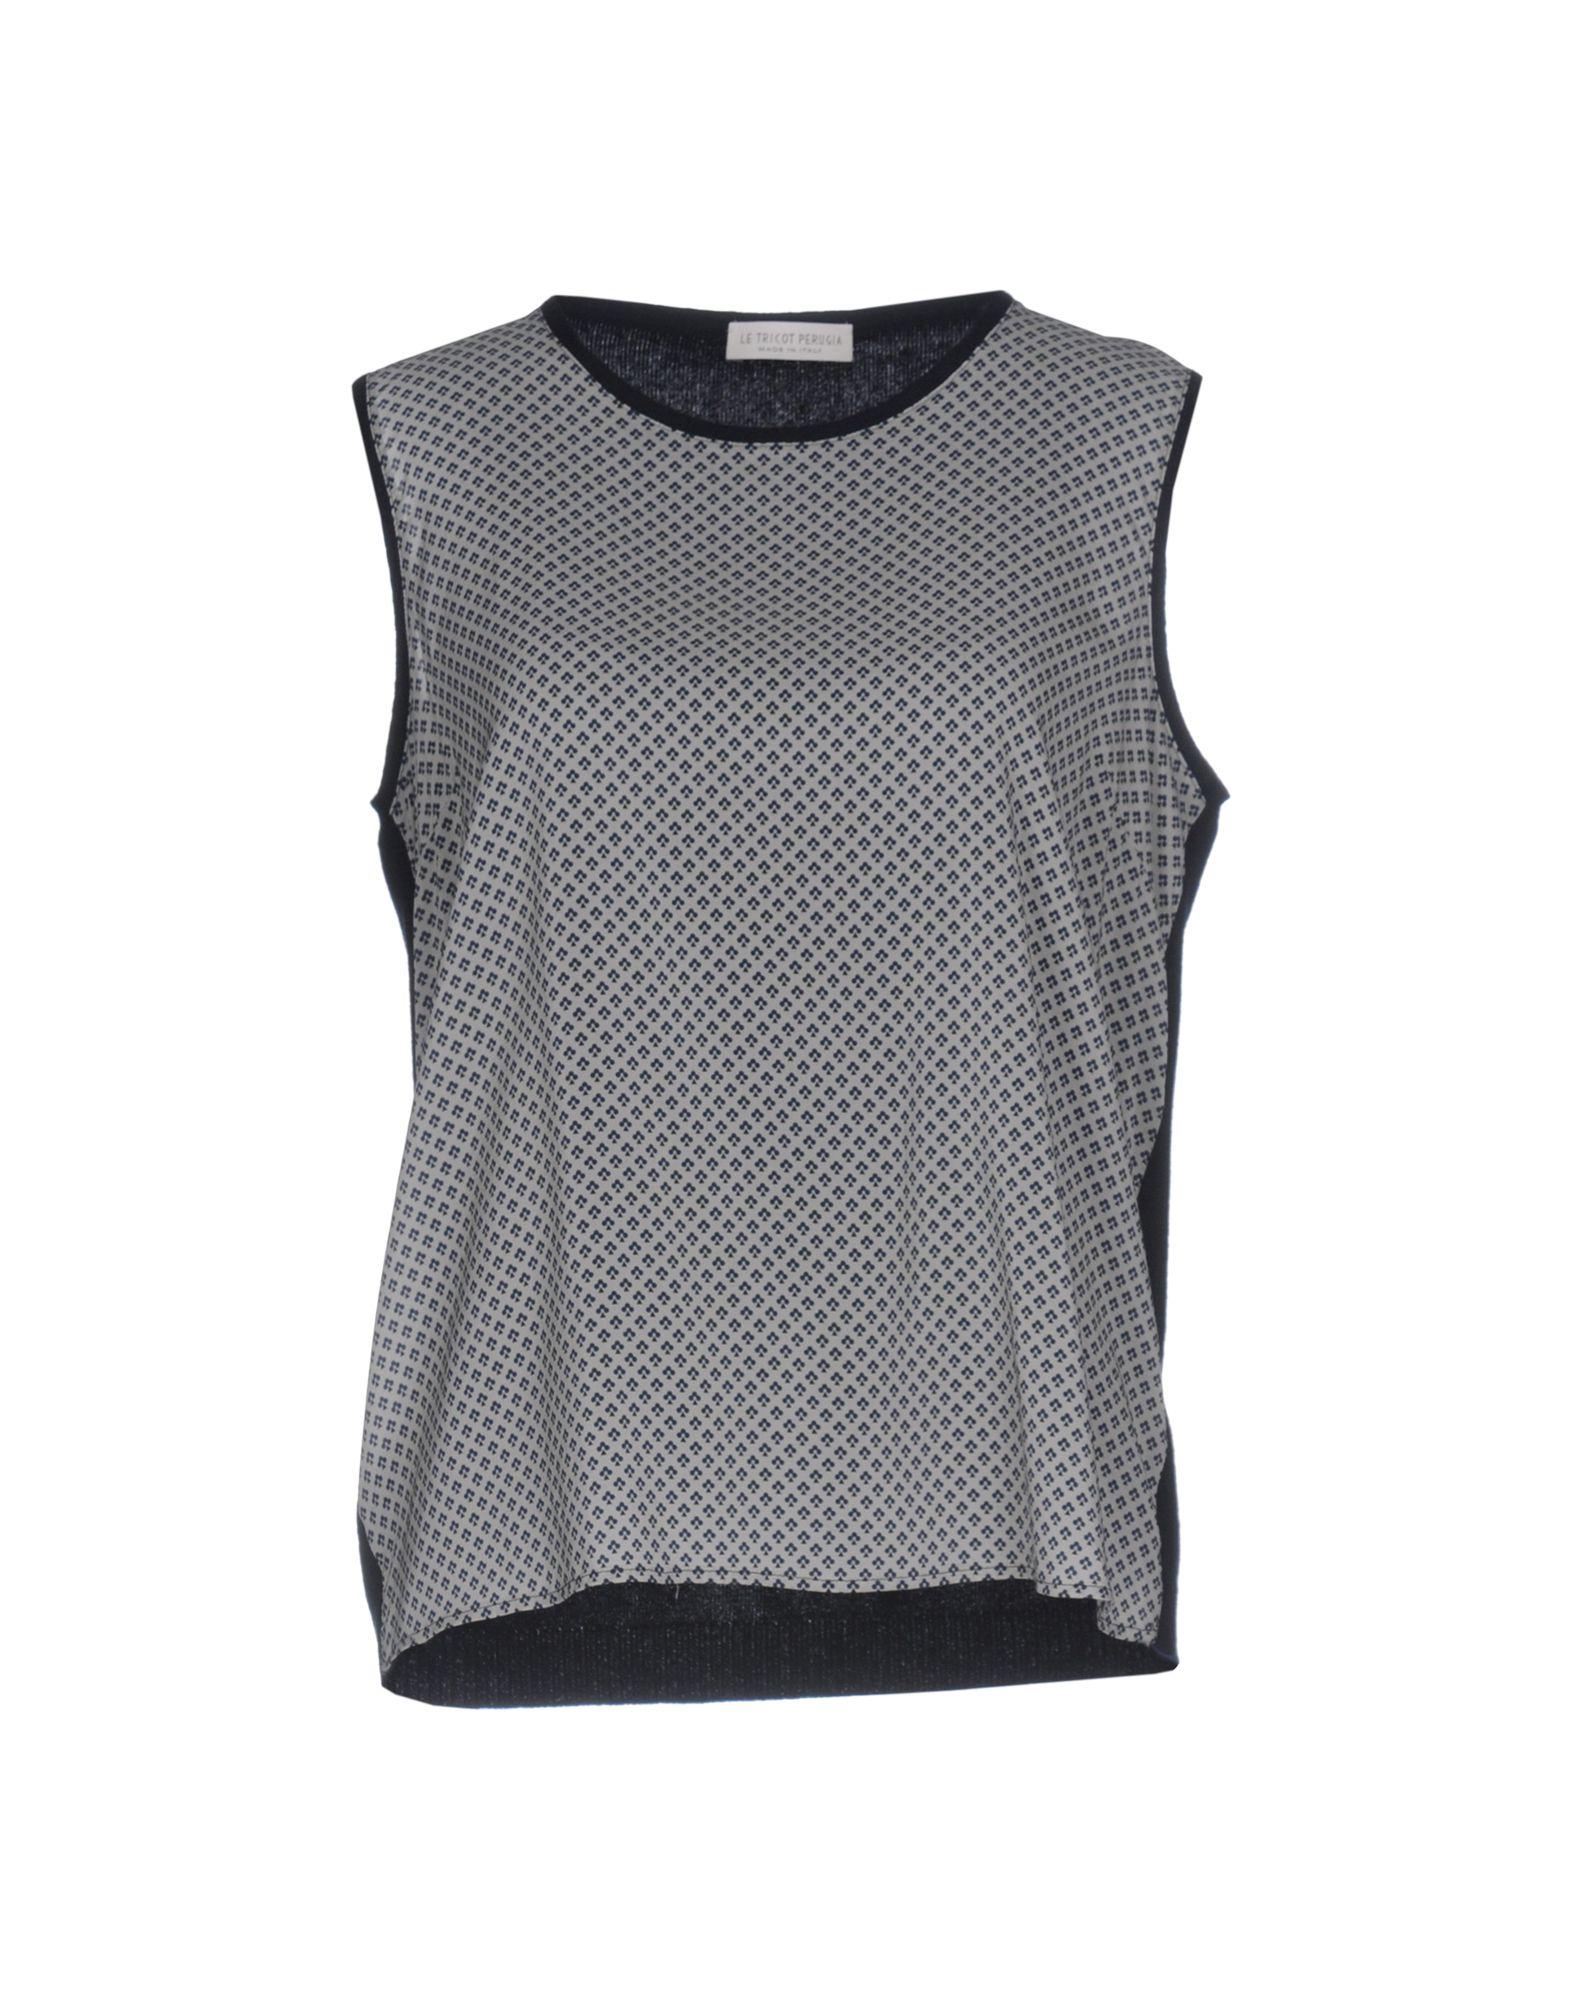 LE TRICOT PERUGIA Damen Pullover Farbe Grau Größe 5 - broschei